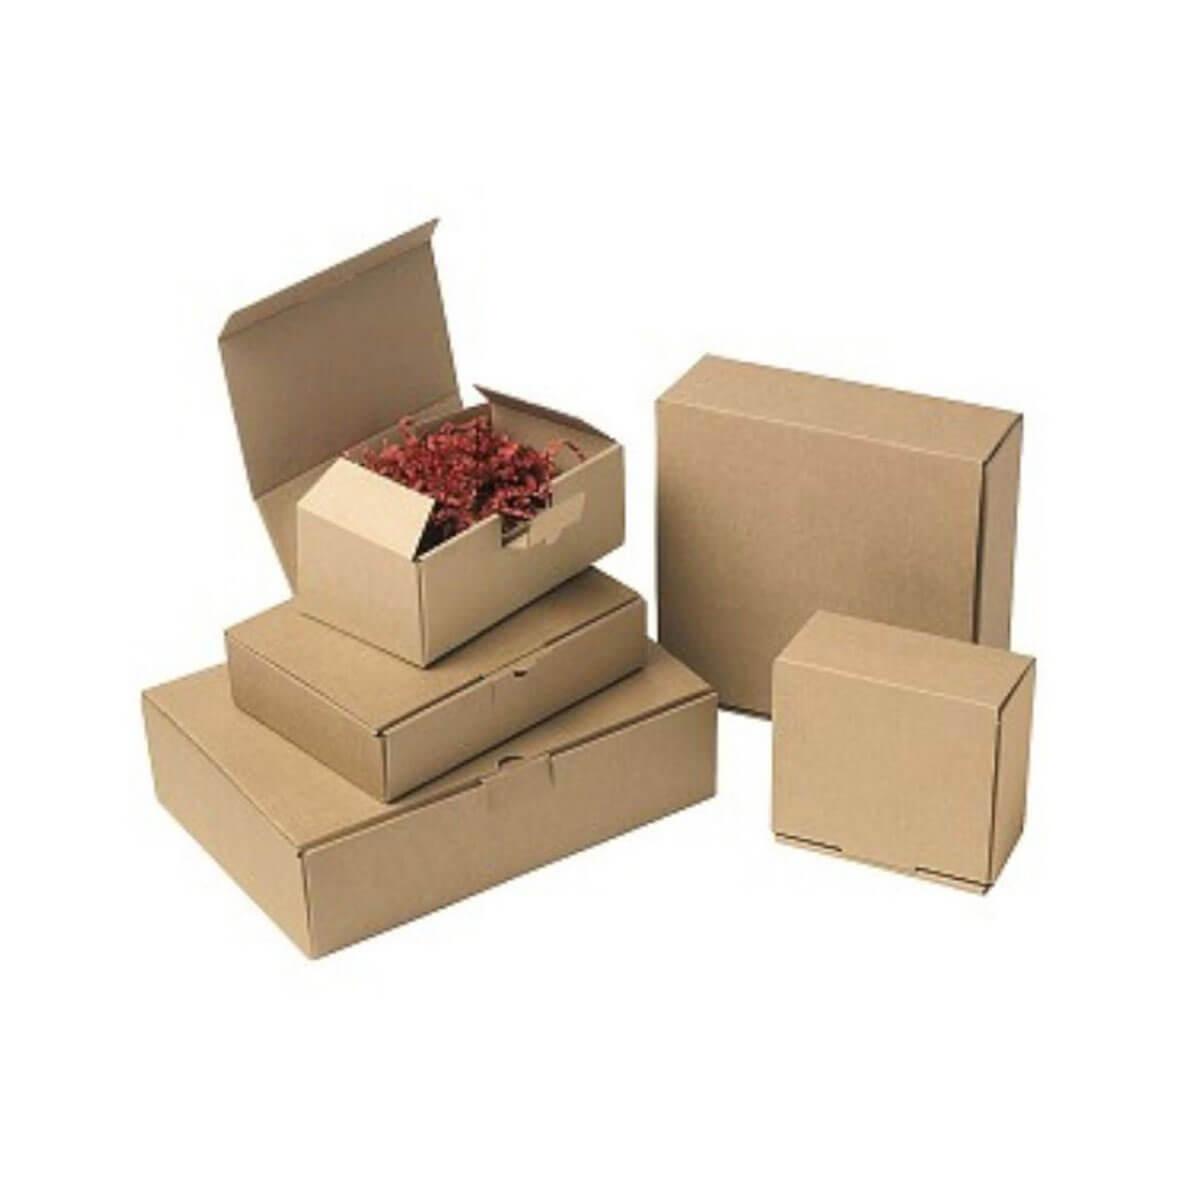 postage bioxes